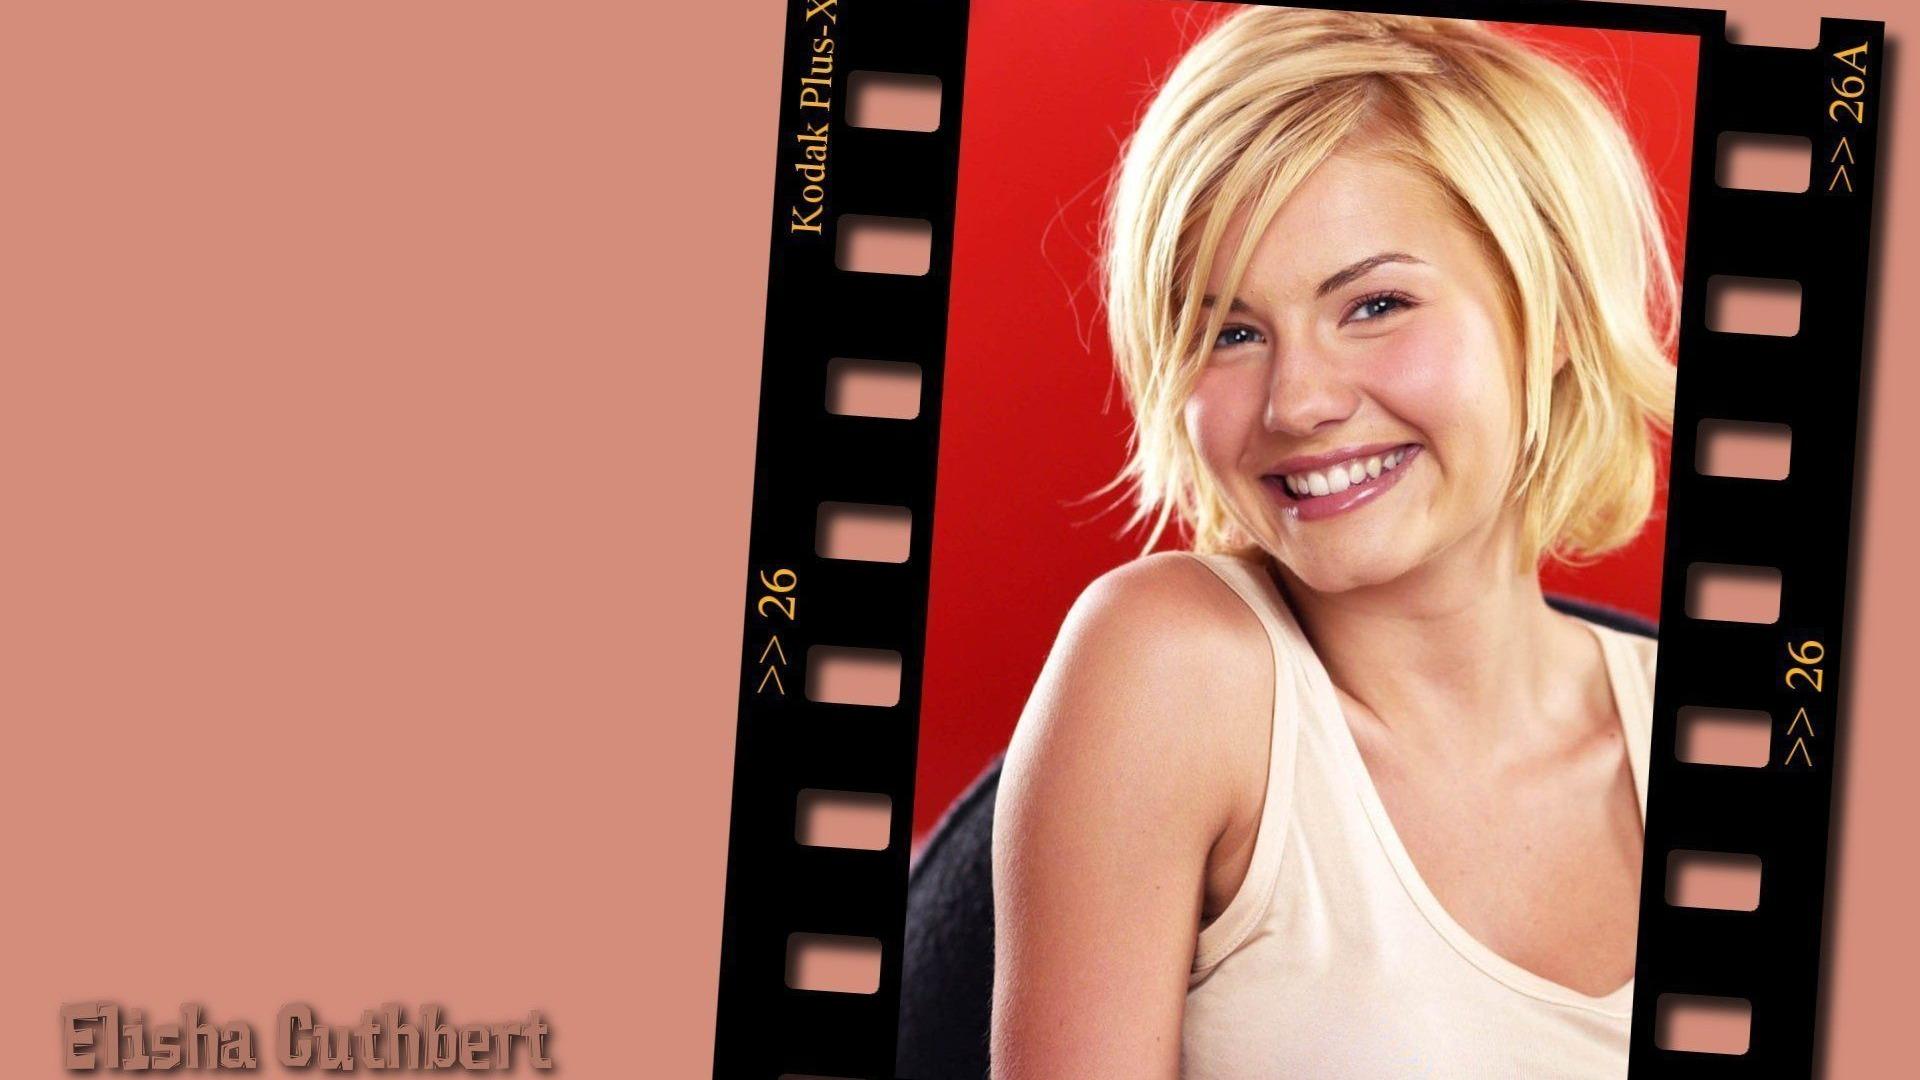 Elisha Cuthbert 014 1920x1080 Wallpaper Download Starswallpaper